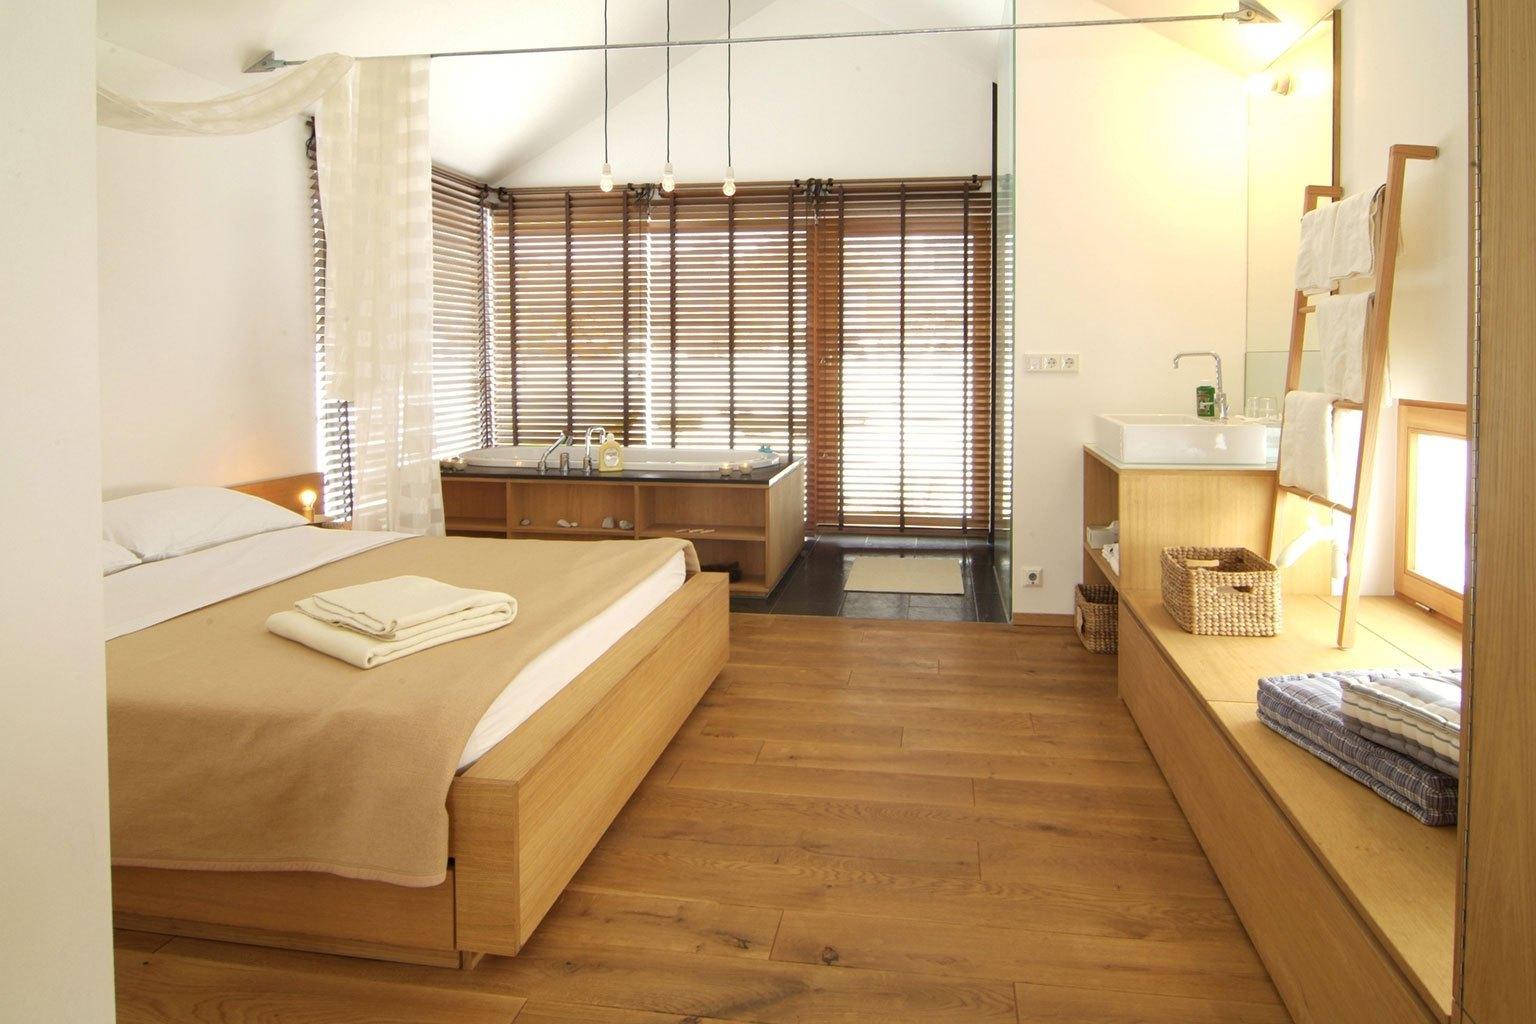 hofgut hafnerleiten in bad birnbach designreisen. Black Bedroom Furniture Sets. Home Design Ideas